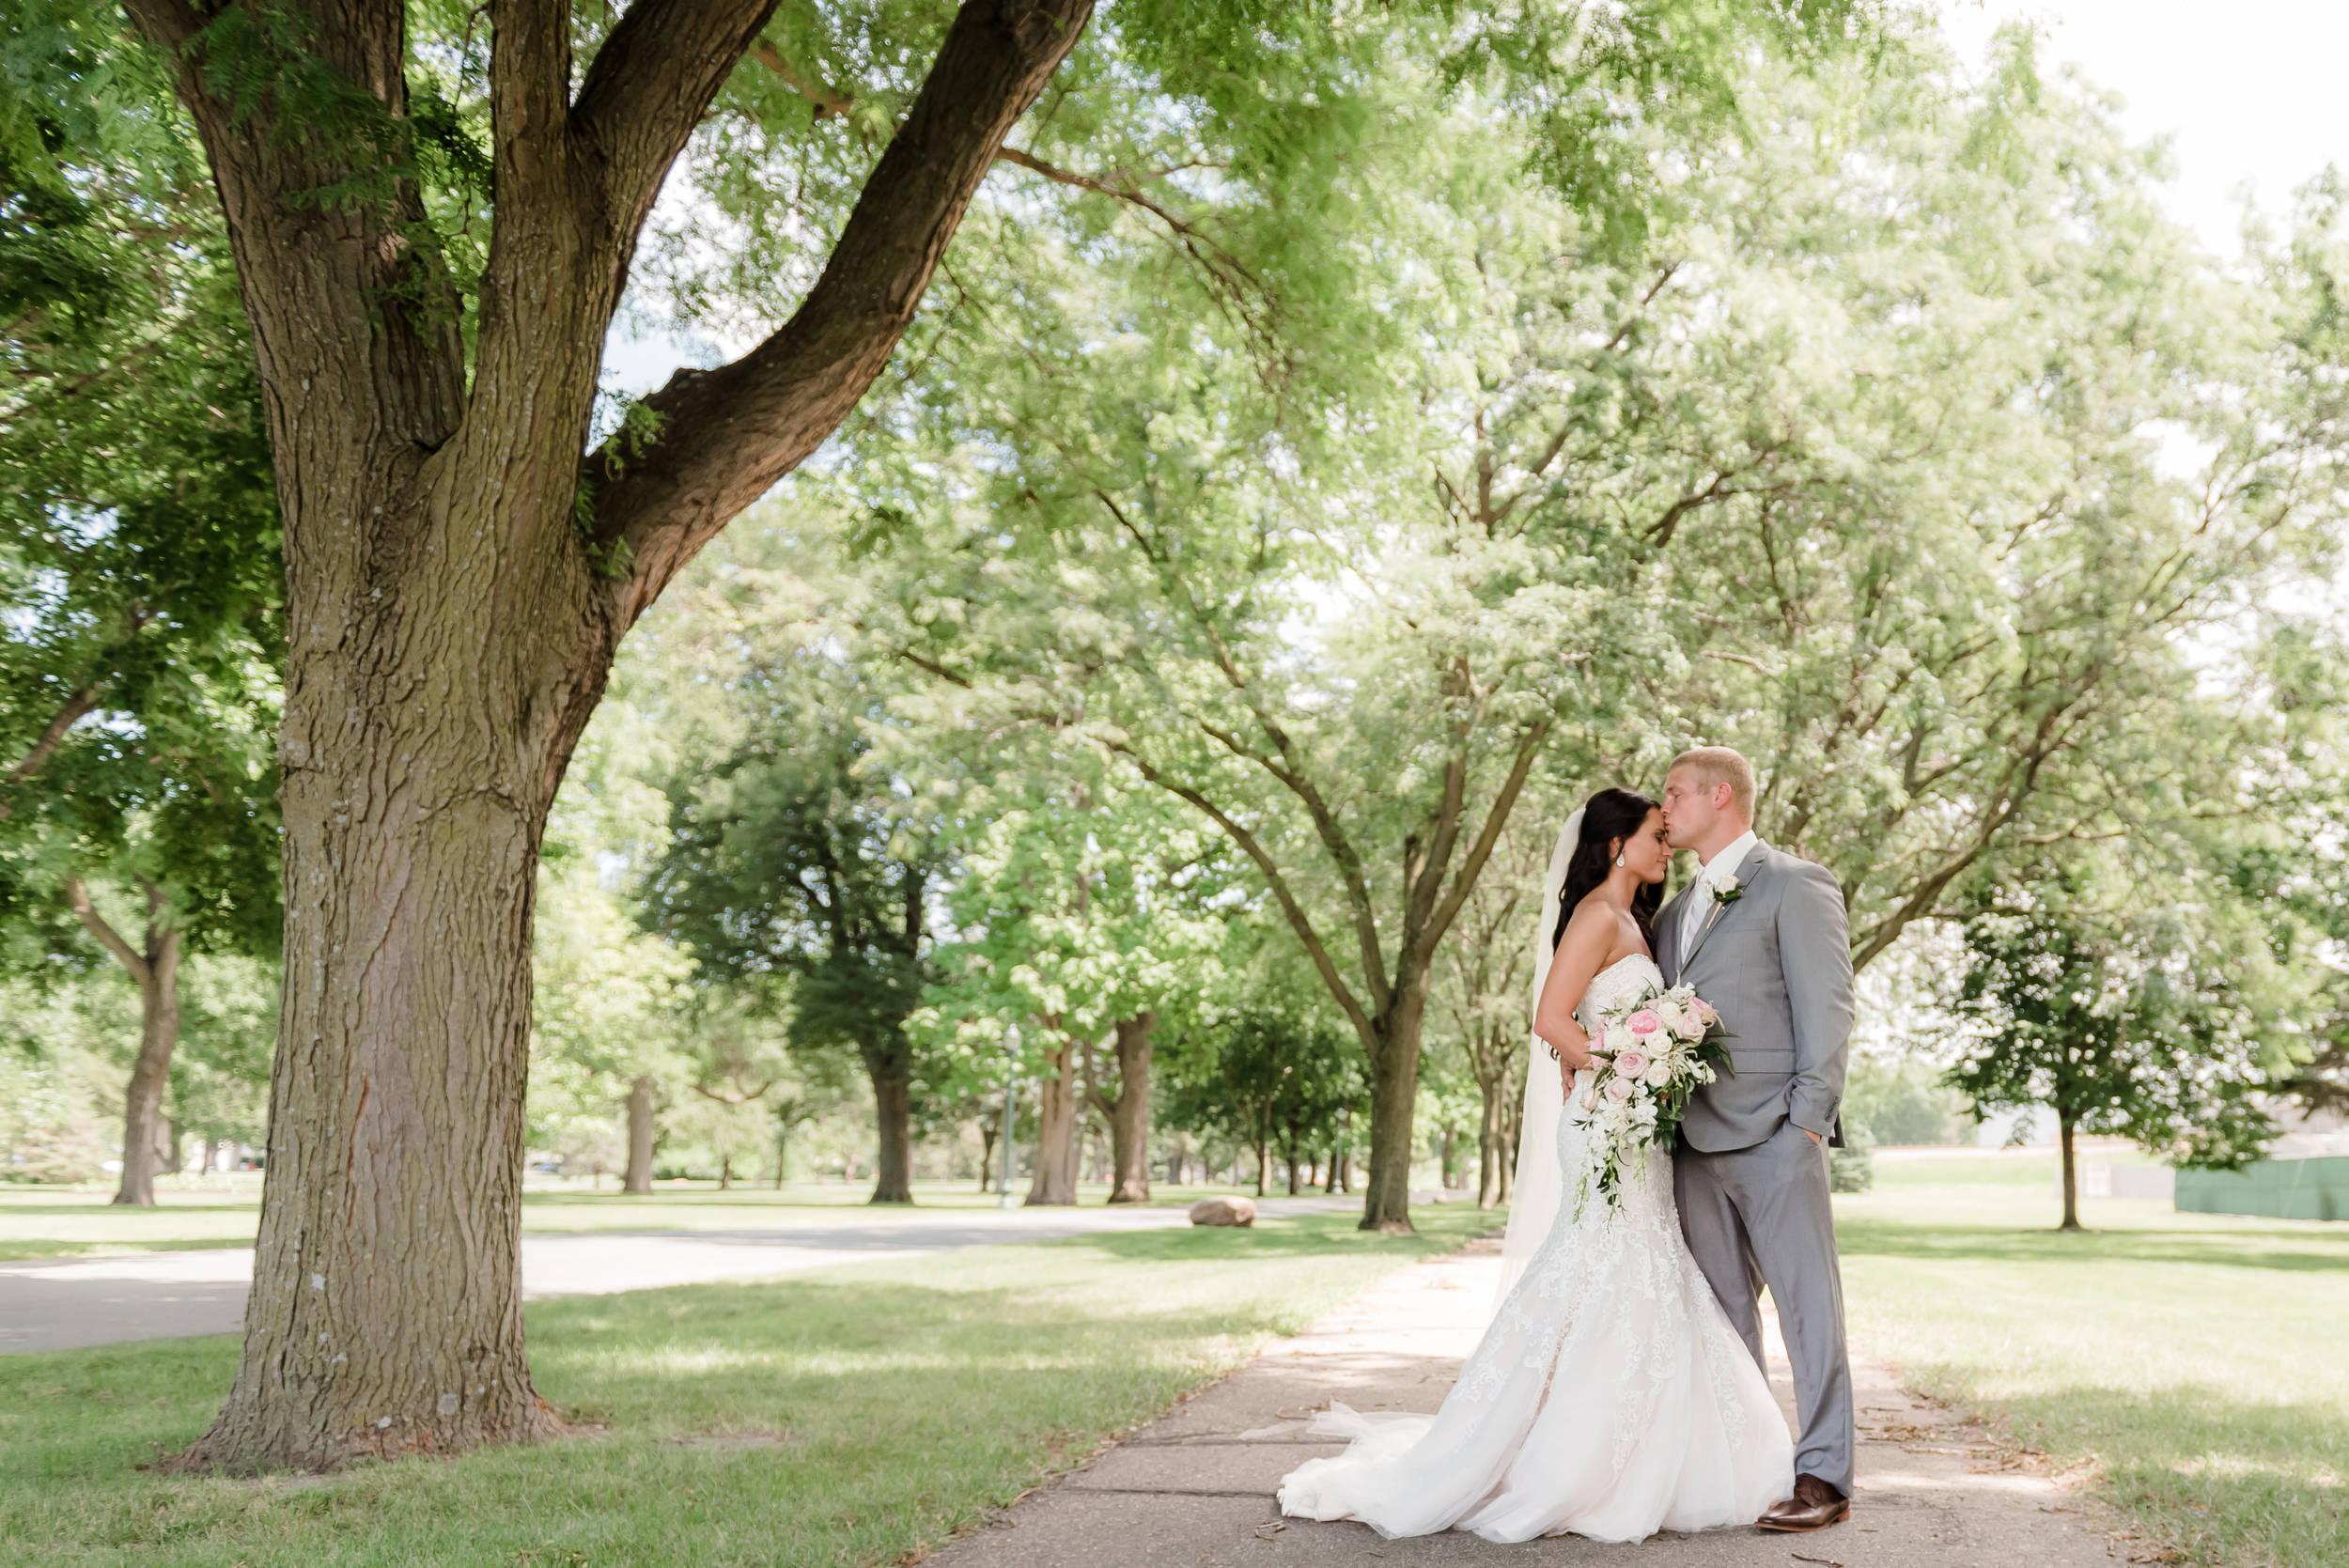 Layce and Brandon - Wedding - Outdoor Portraits-96.jpg